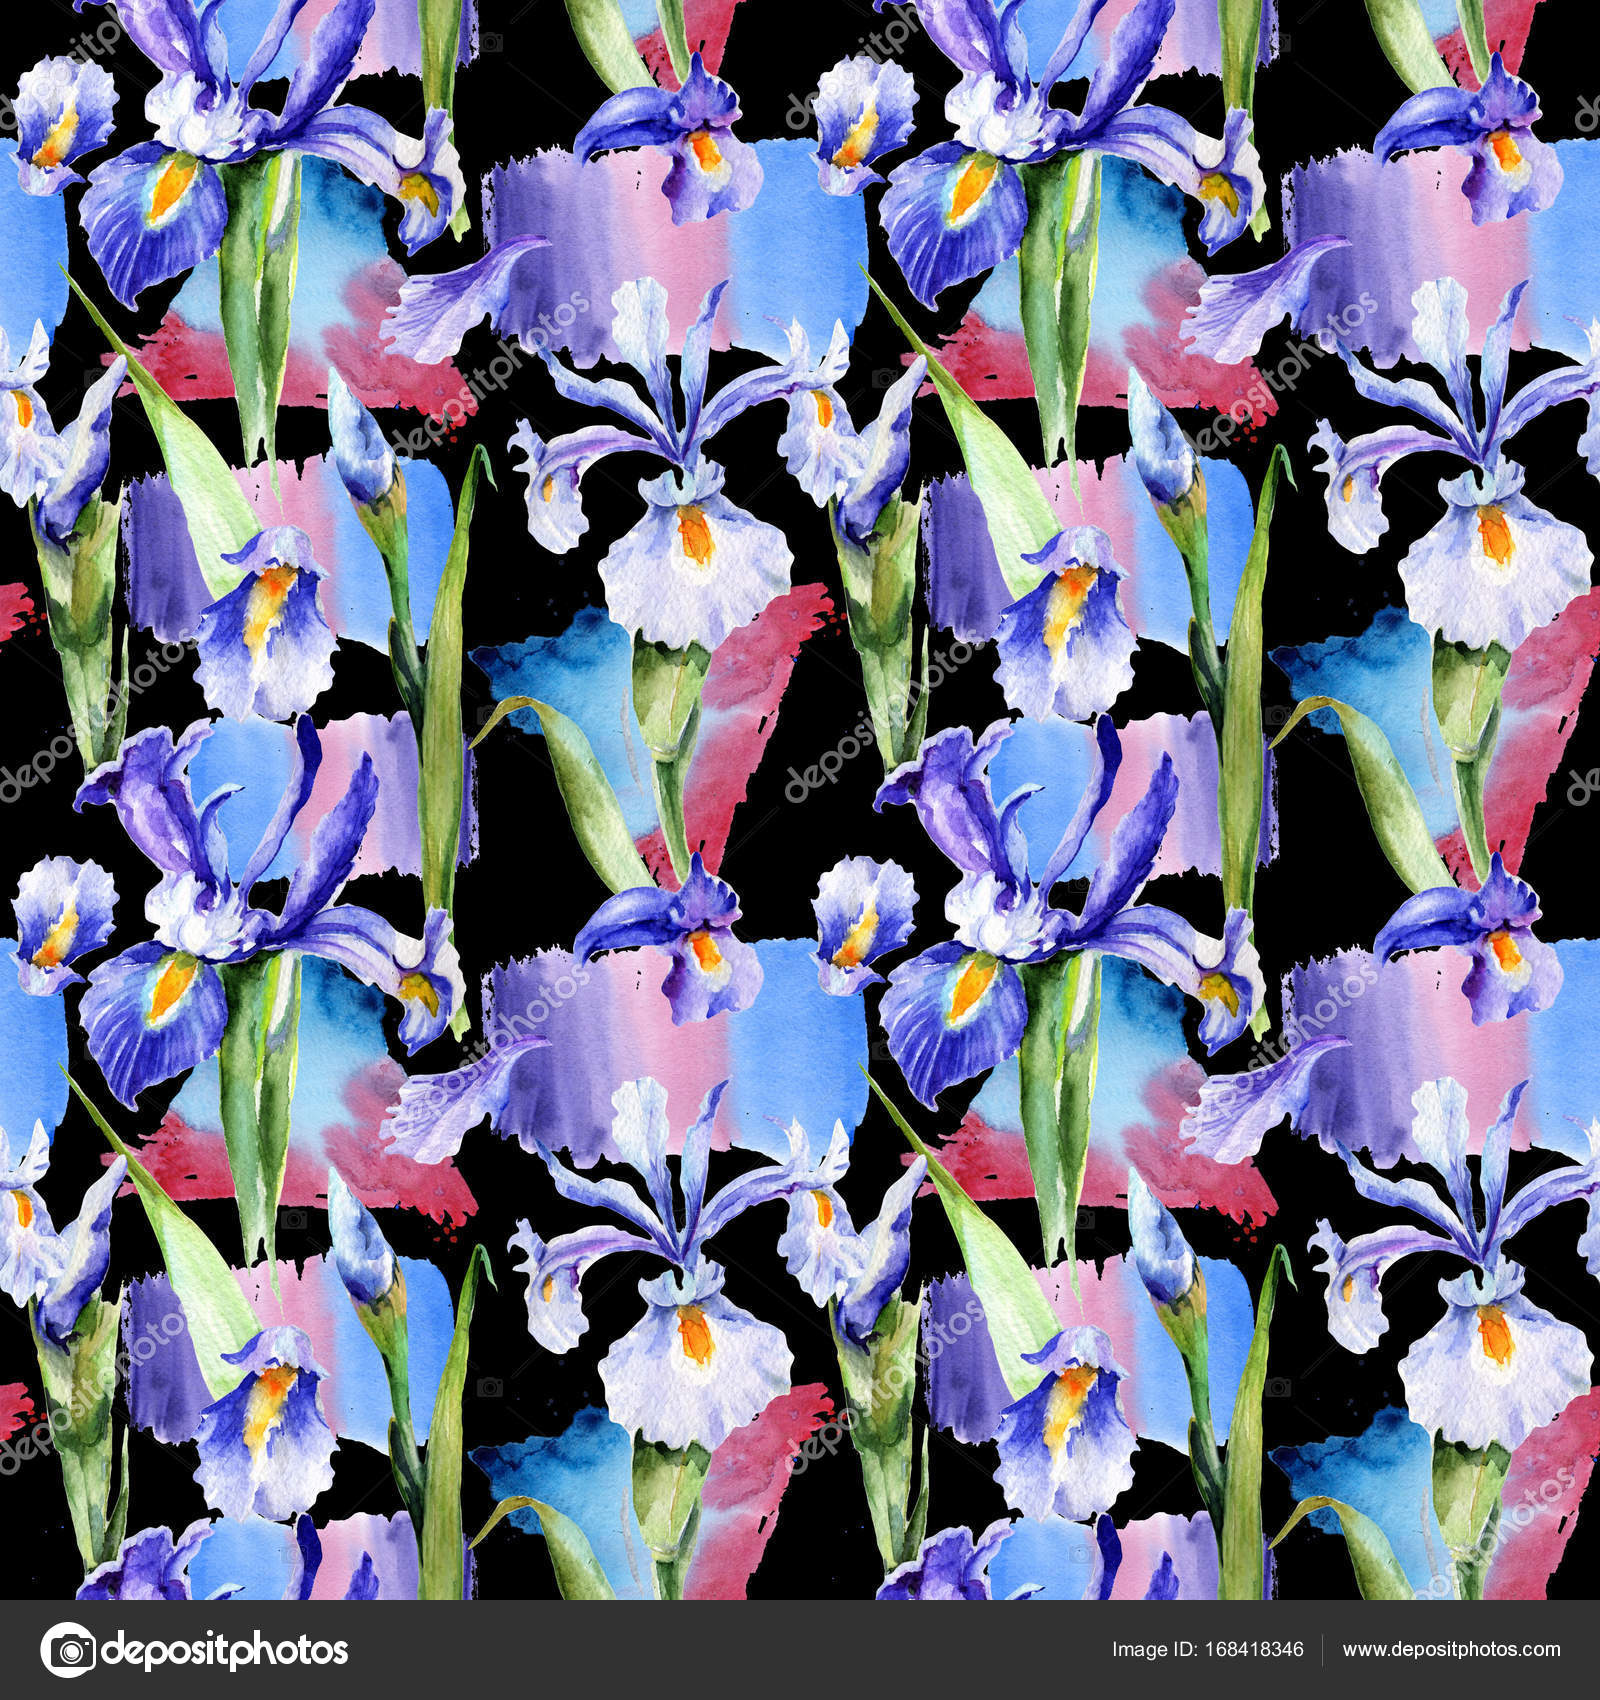 Wildflower iris flower pattern in a watercolor style stock photo wildflower iris flower pattern in a watercolor style full name of the plant blue iris aquarelle wild flower for background texture wrapper pattern izmirmasajfo